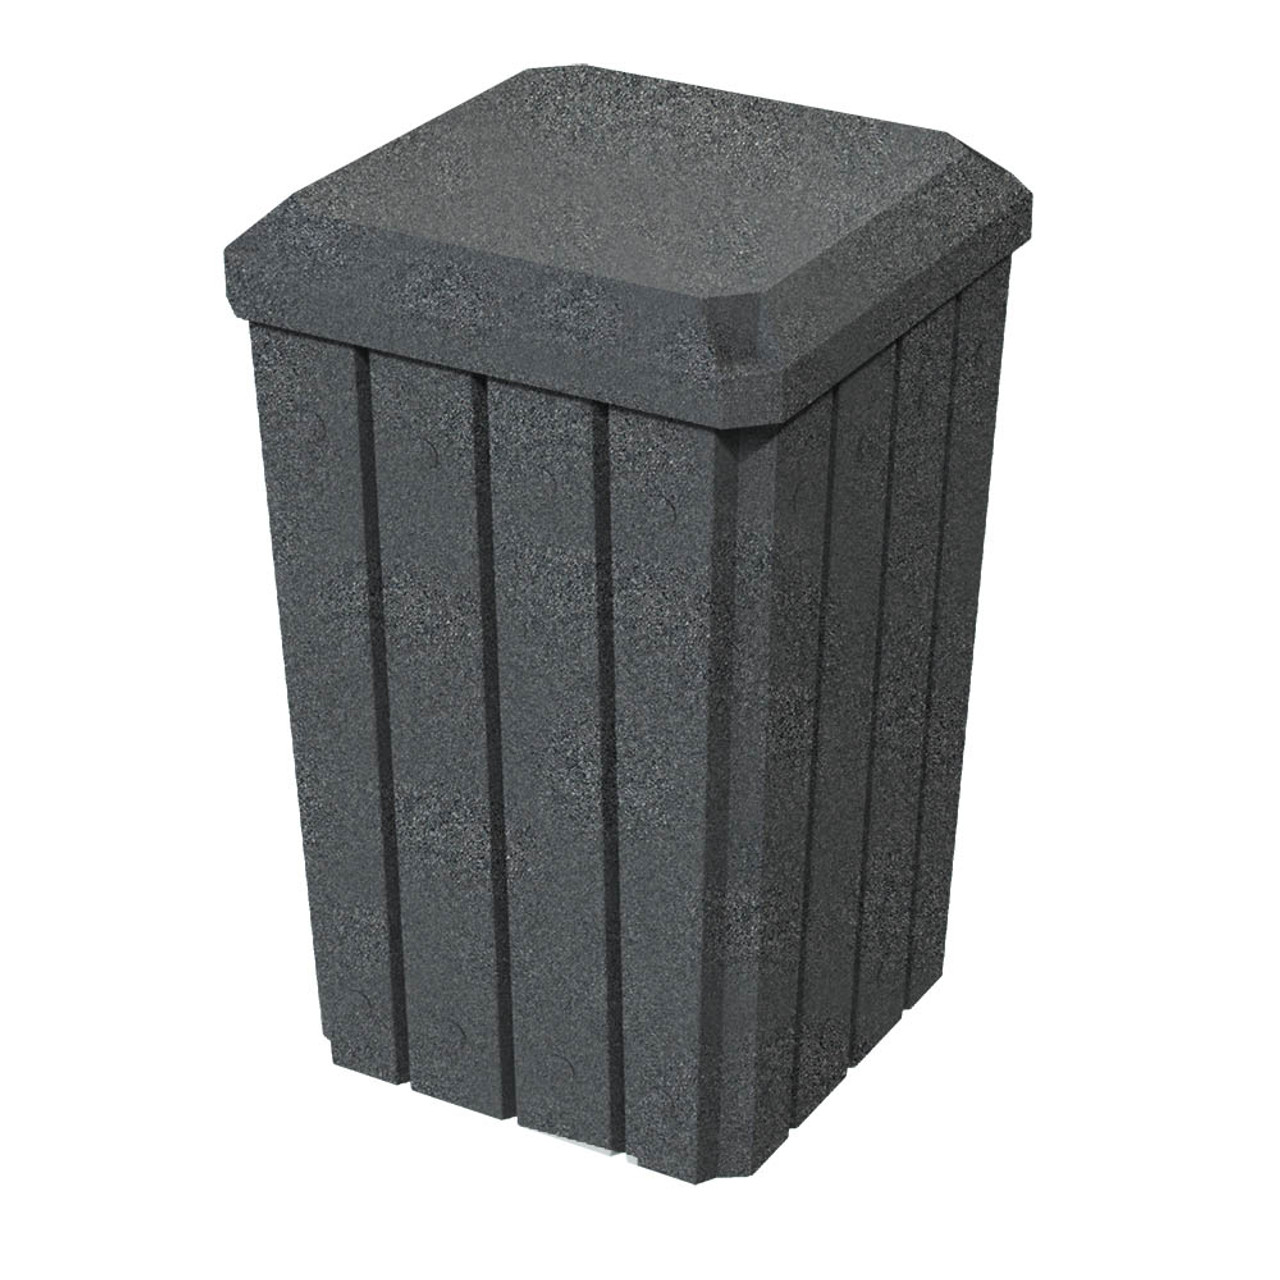 32 Gallon Kolor Can Heavy Duty Dust Cover Enclosed Trash Bin S8292A-00 DARK GRANITE